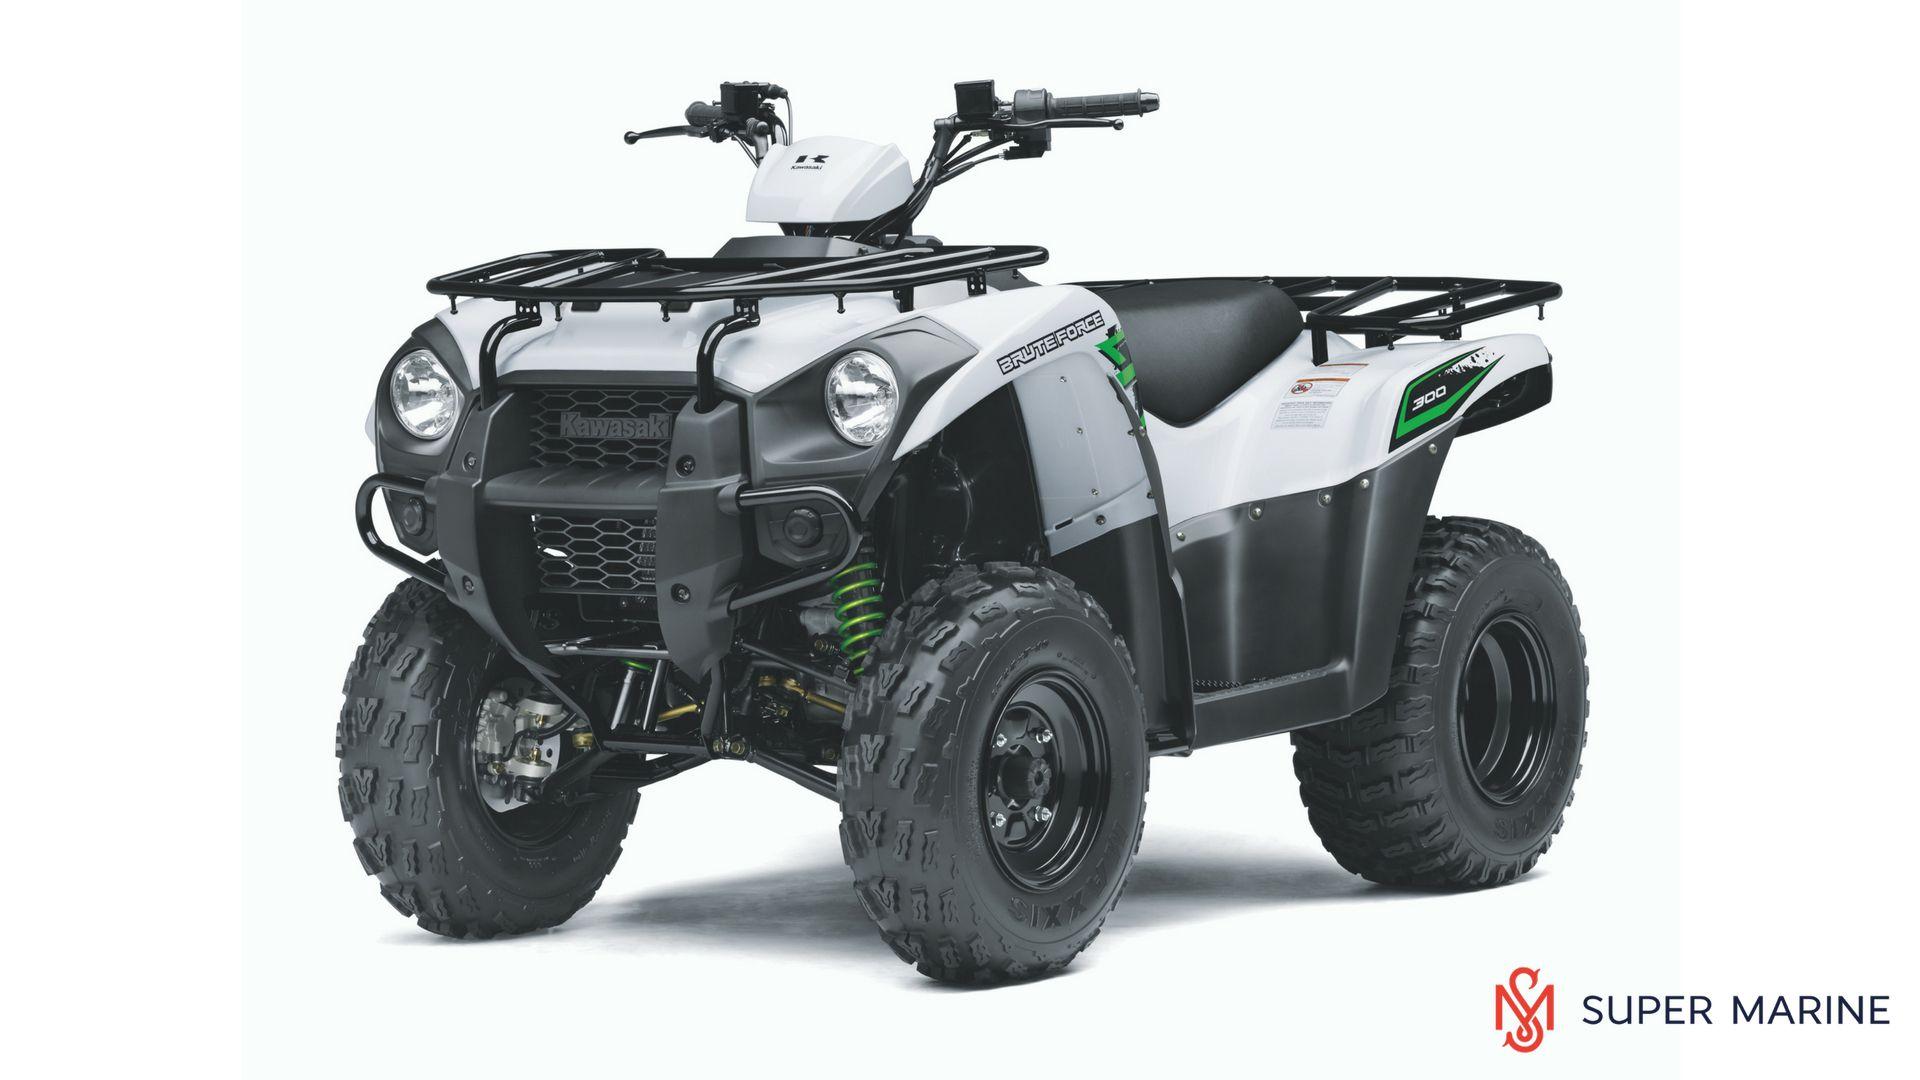 Квадроцикл Kawasaki Brute Force 300 Белый 2020 - 1